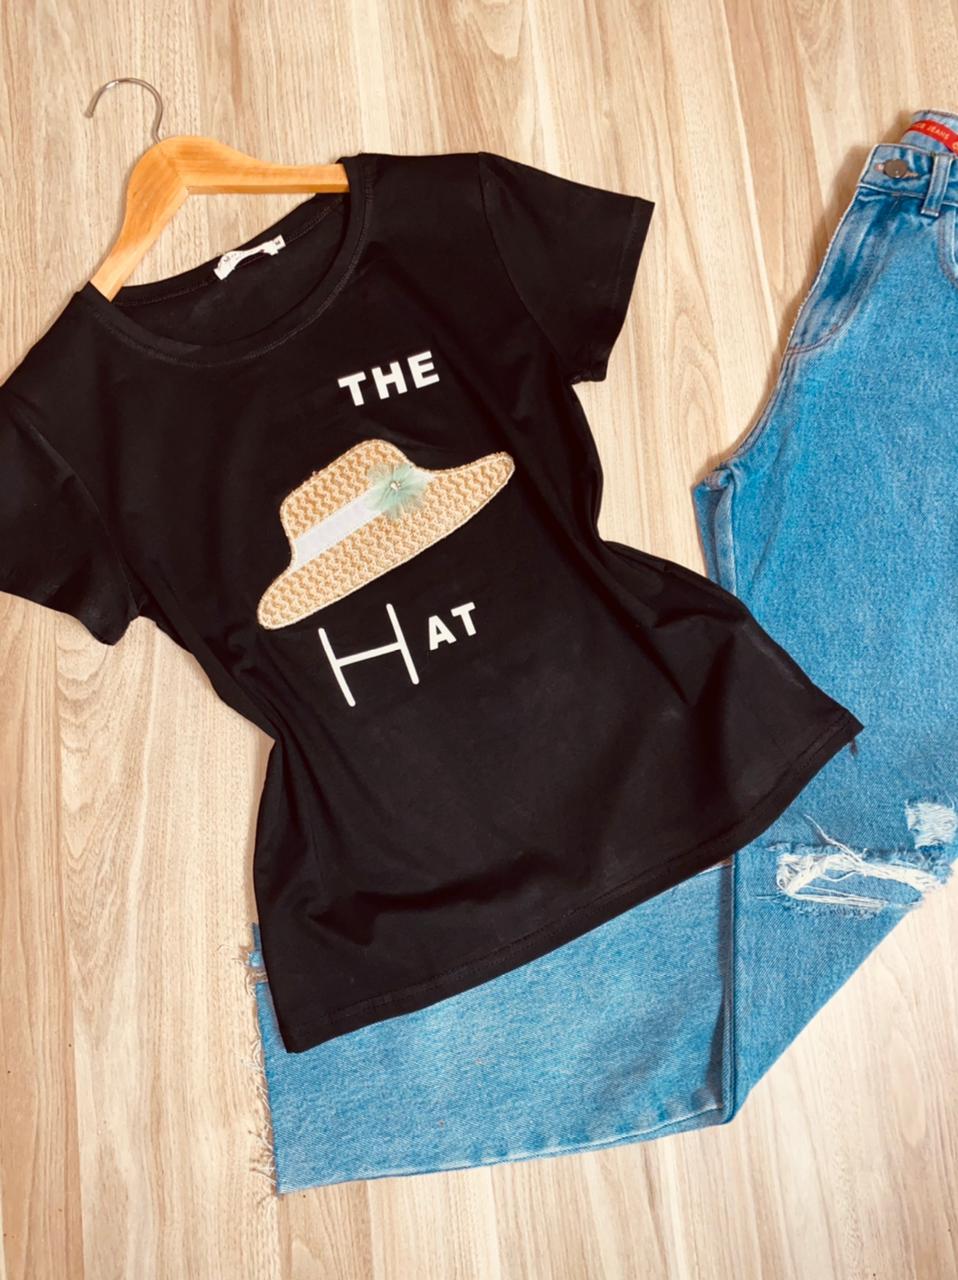 T-shirt Top The Hat Black